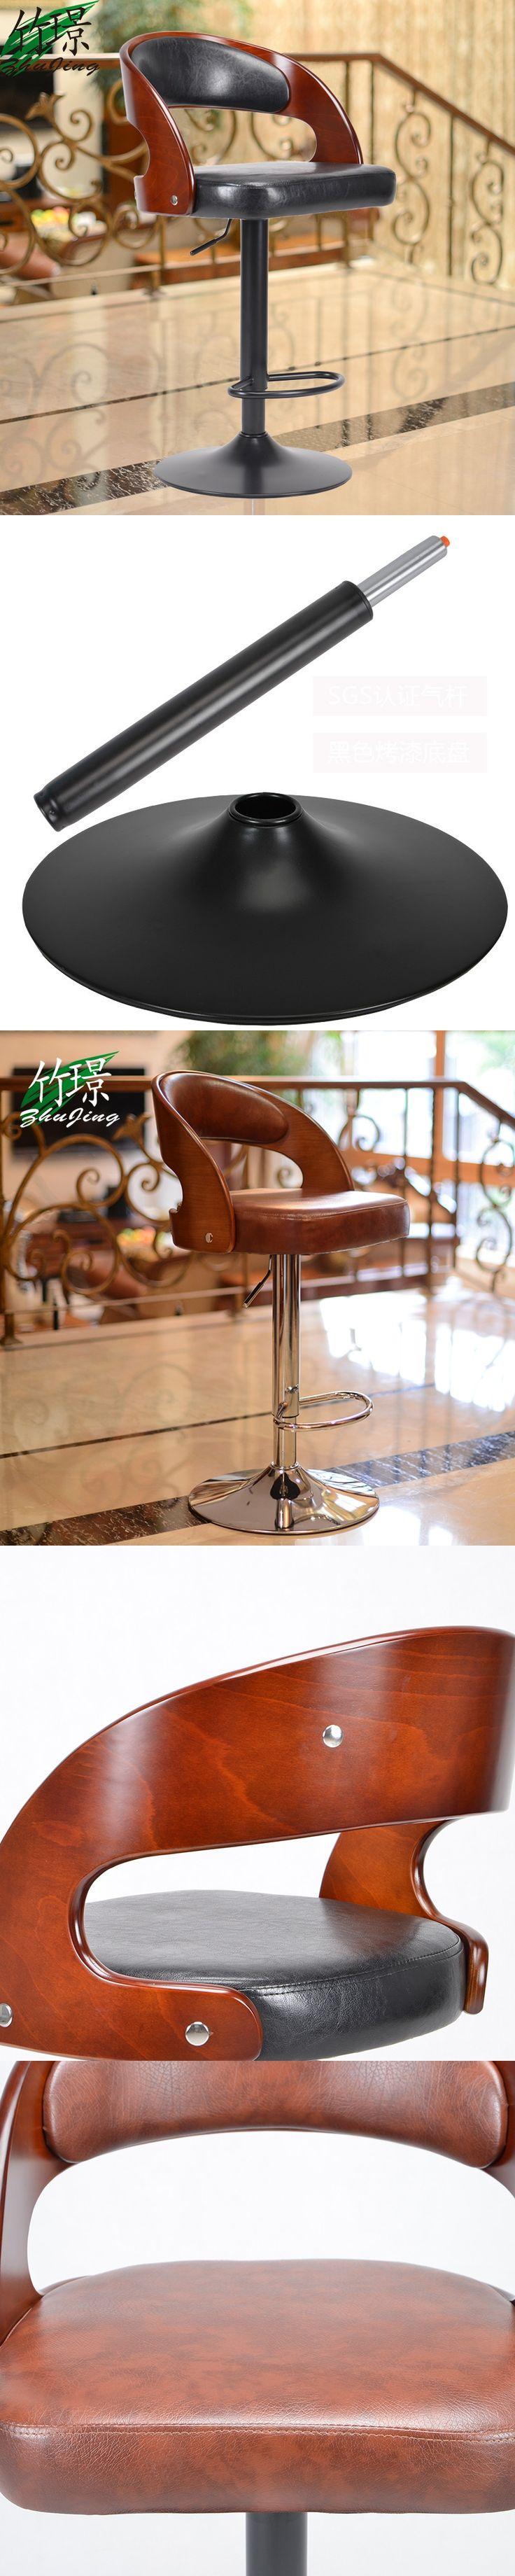 b2624cb1fd75ee0cdc01b5cad00d6bff Impressionnant De Table Bar Exterieur Conception